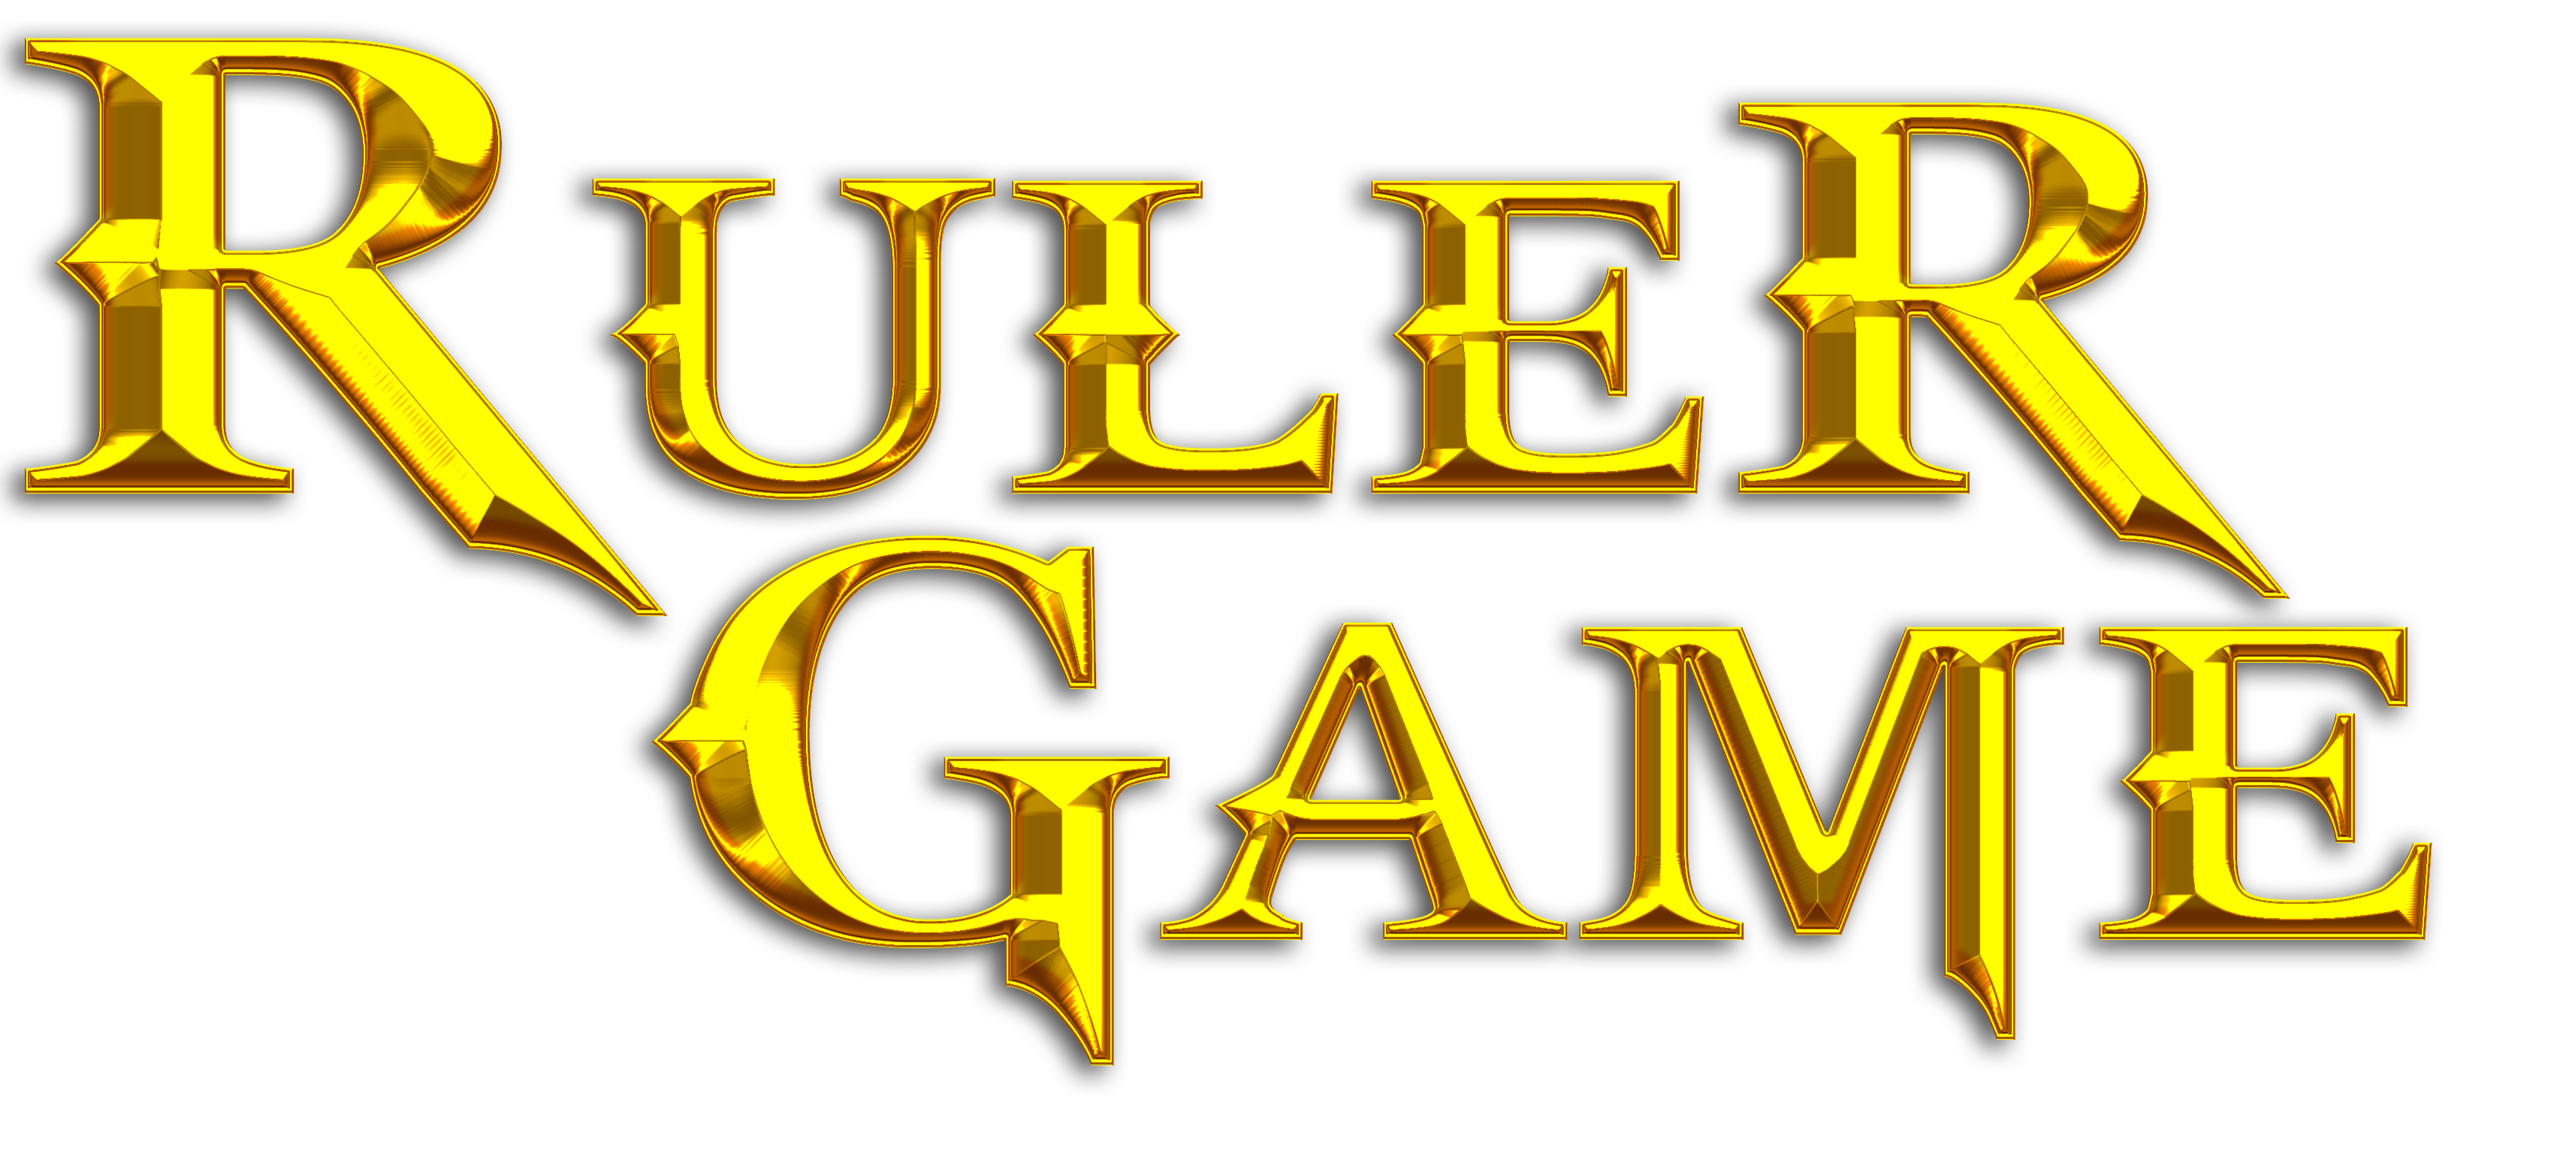 Hurriciane Gamers # v1453 HOMEKO 12.03.2016 Cumartesi 20'00 DA ACILIYOR ! # +2000 USER # KACIRMA !